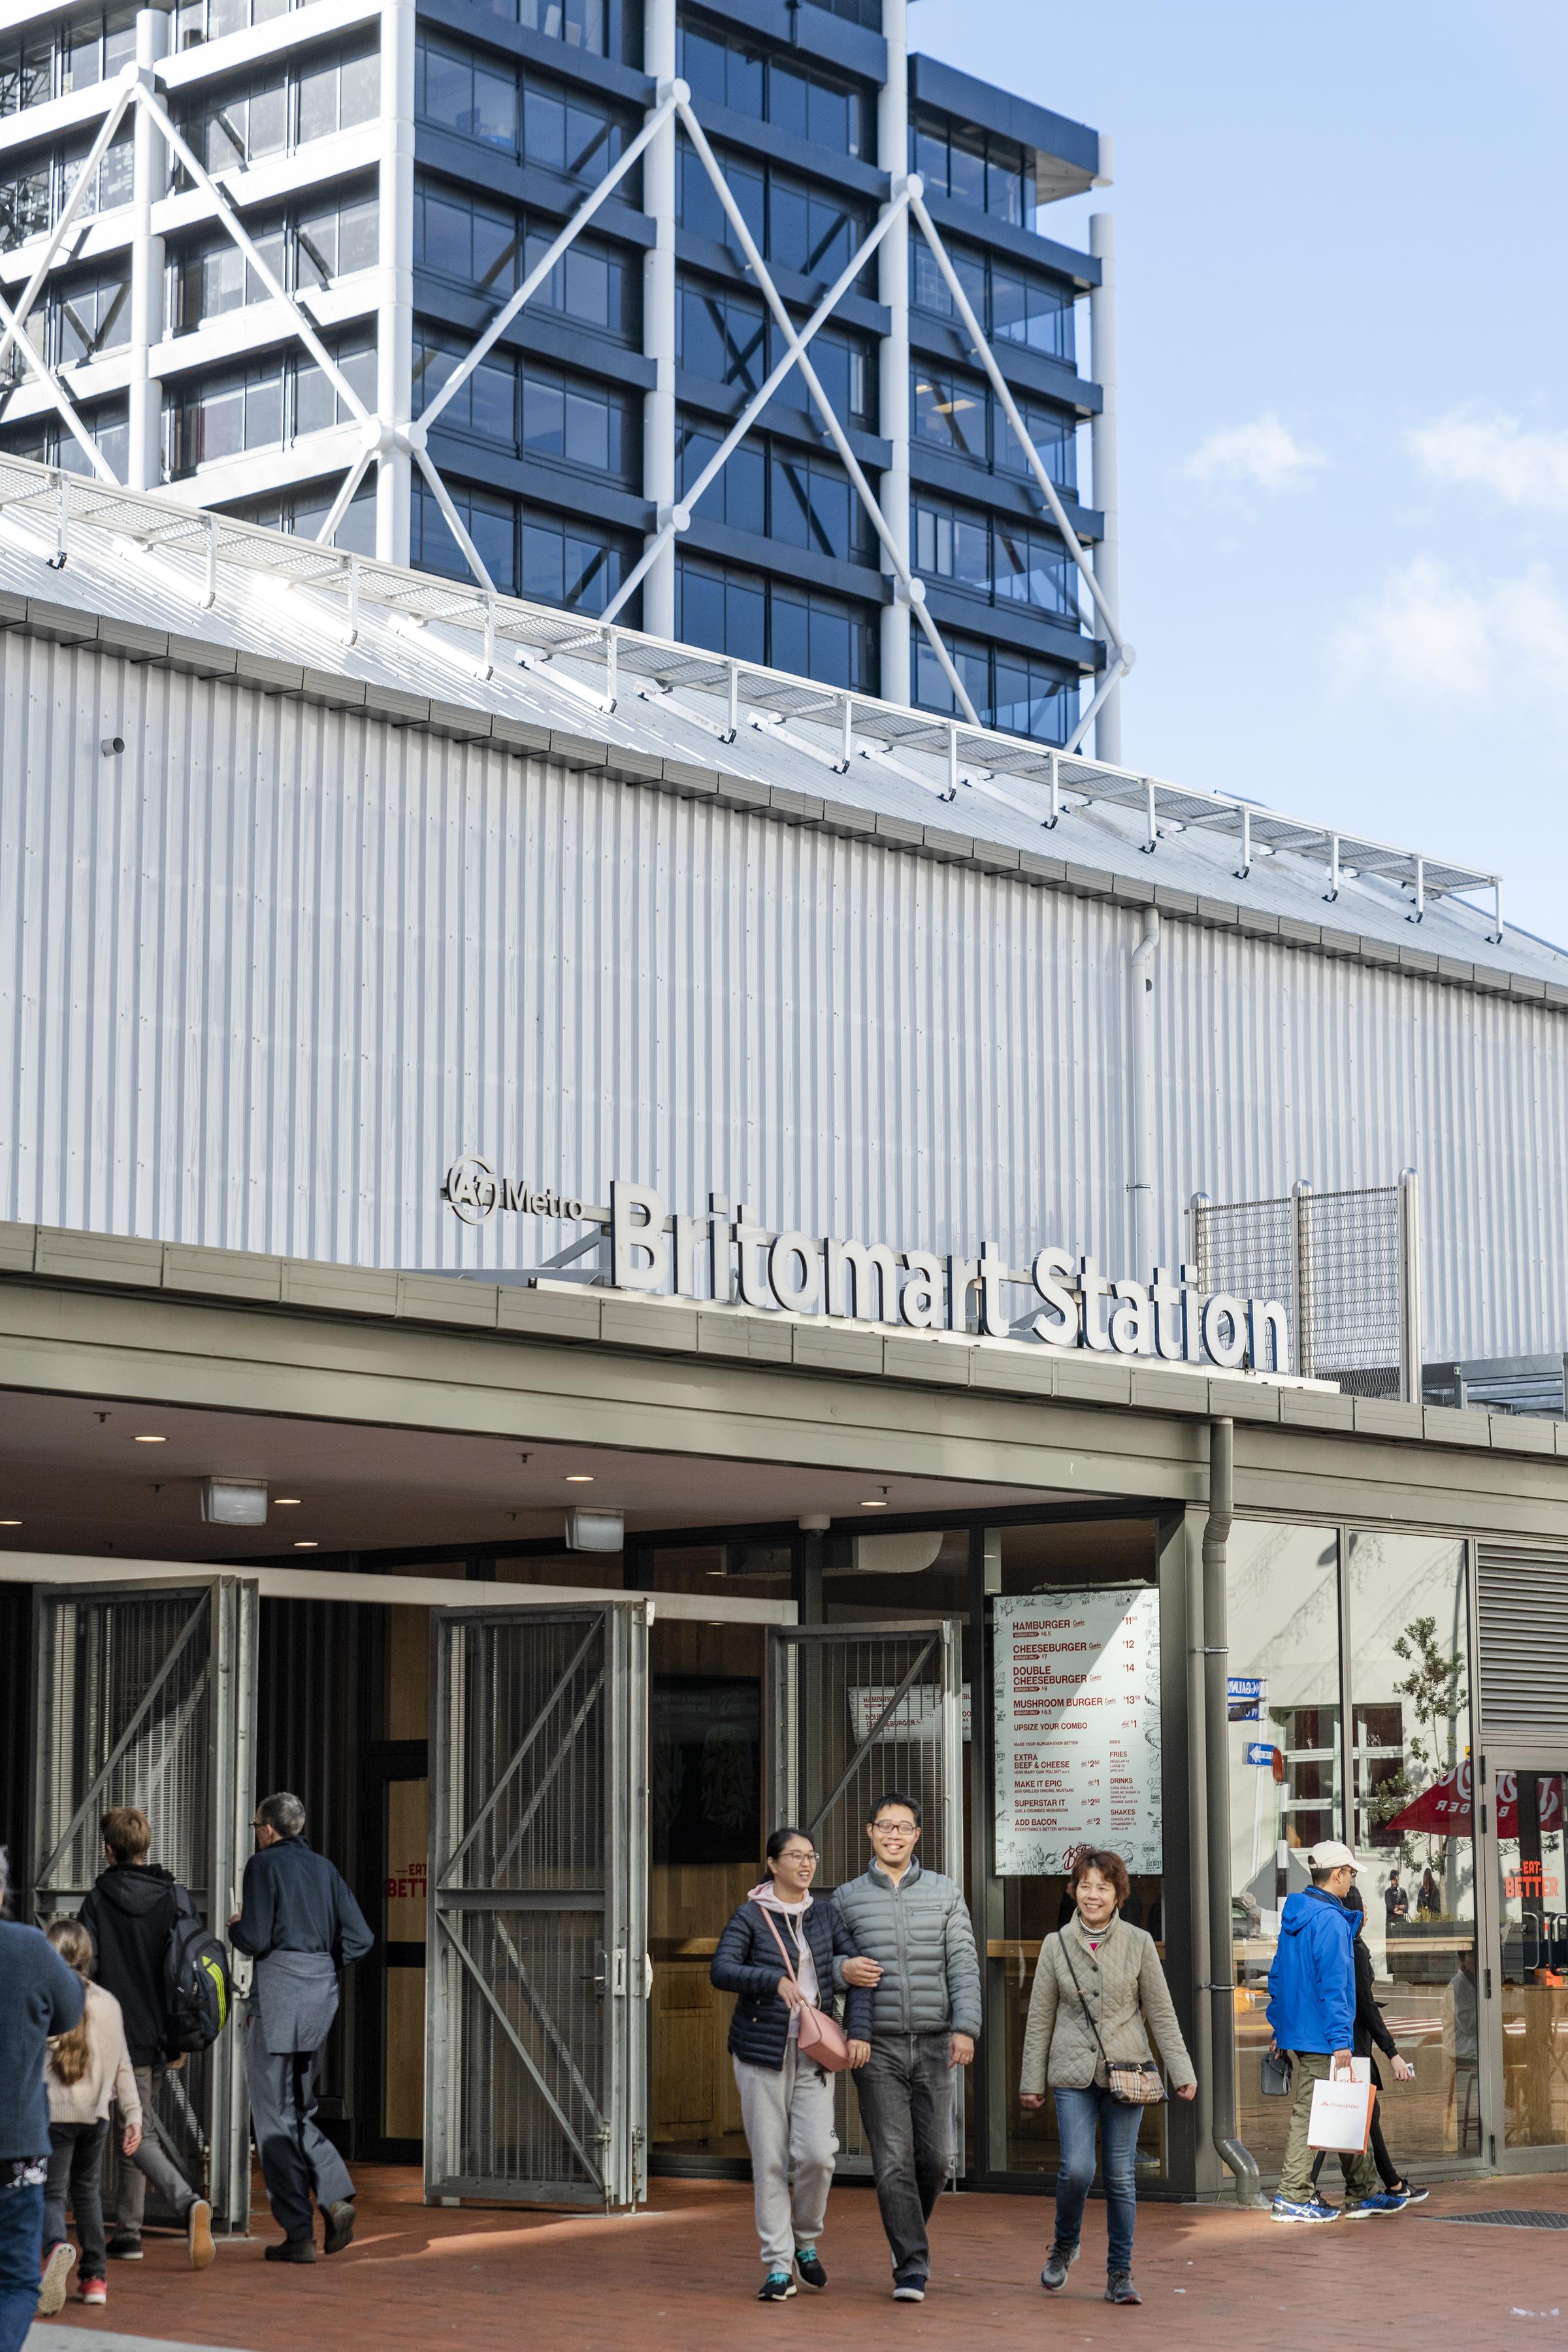 britomart station 02